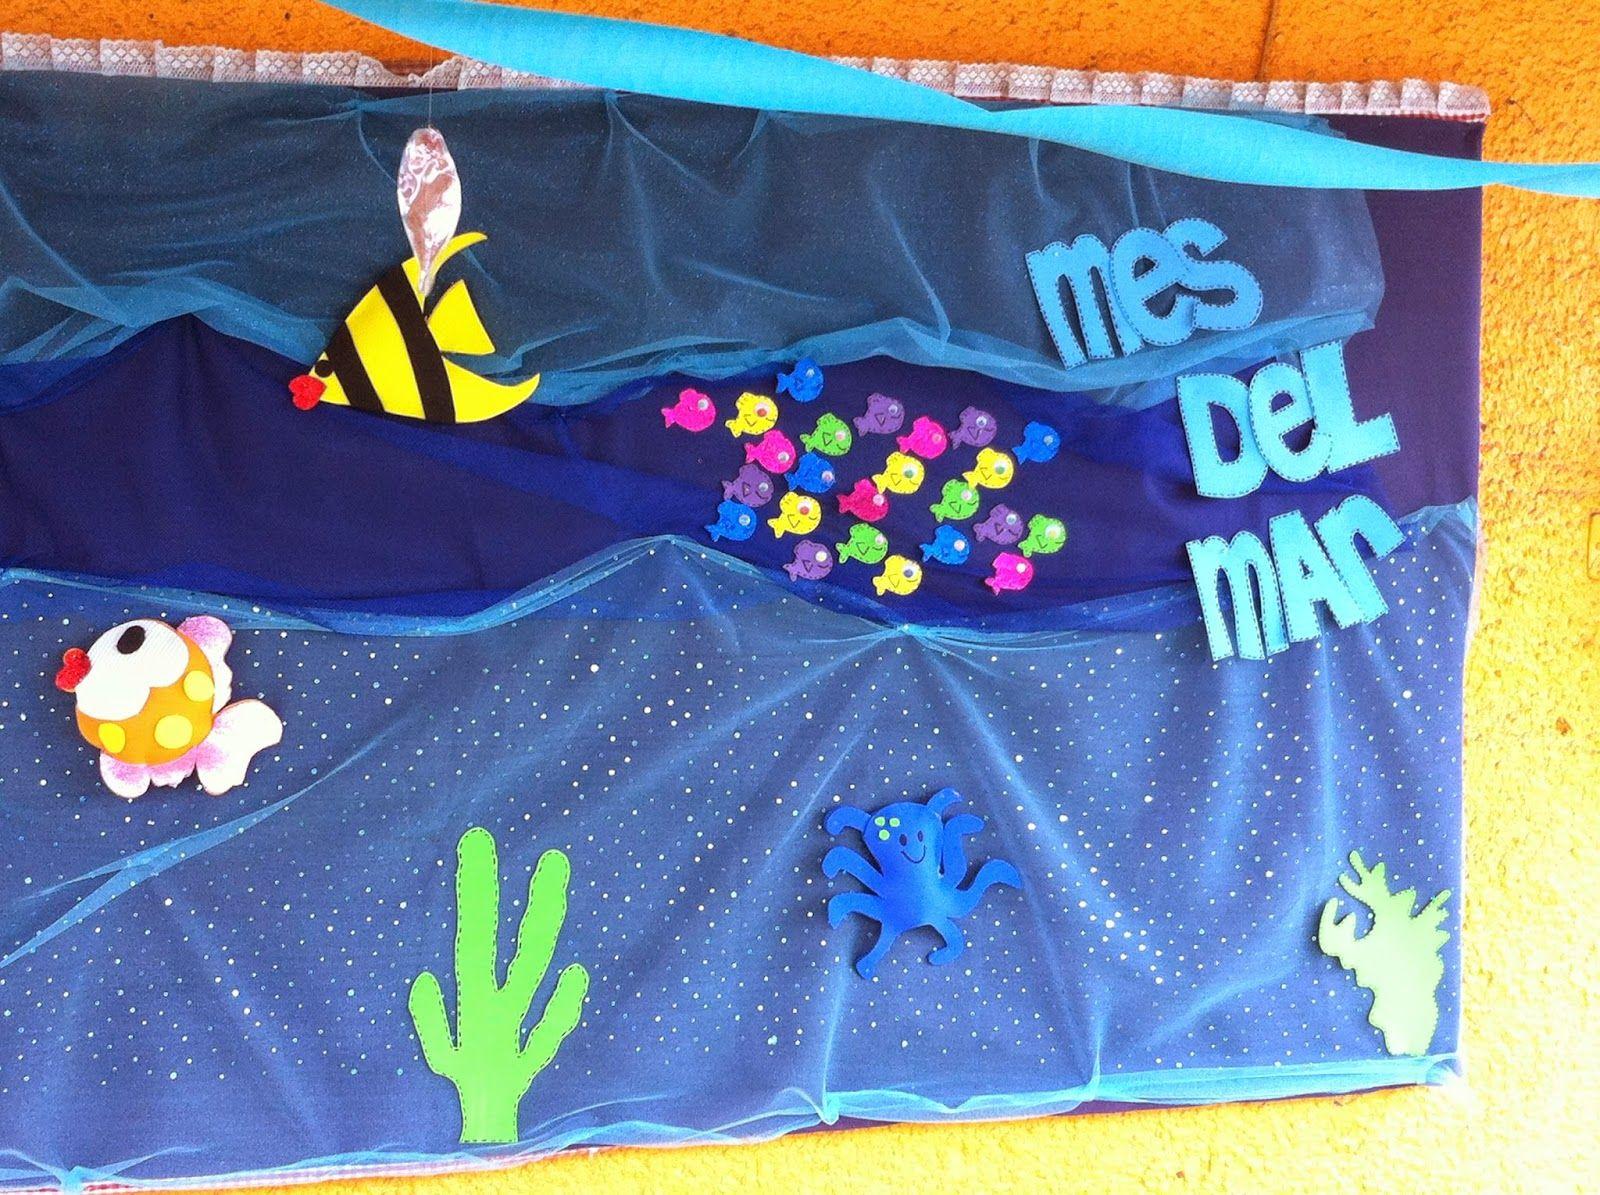 Jard n infantil un mundo de amor muestra de decoraci n for Decoracion verano jardin infantil